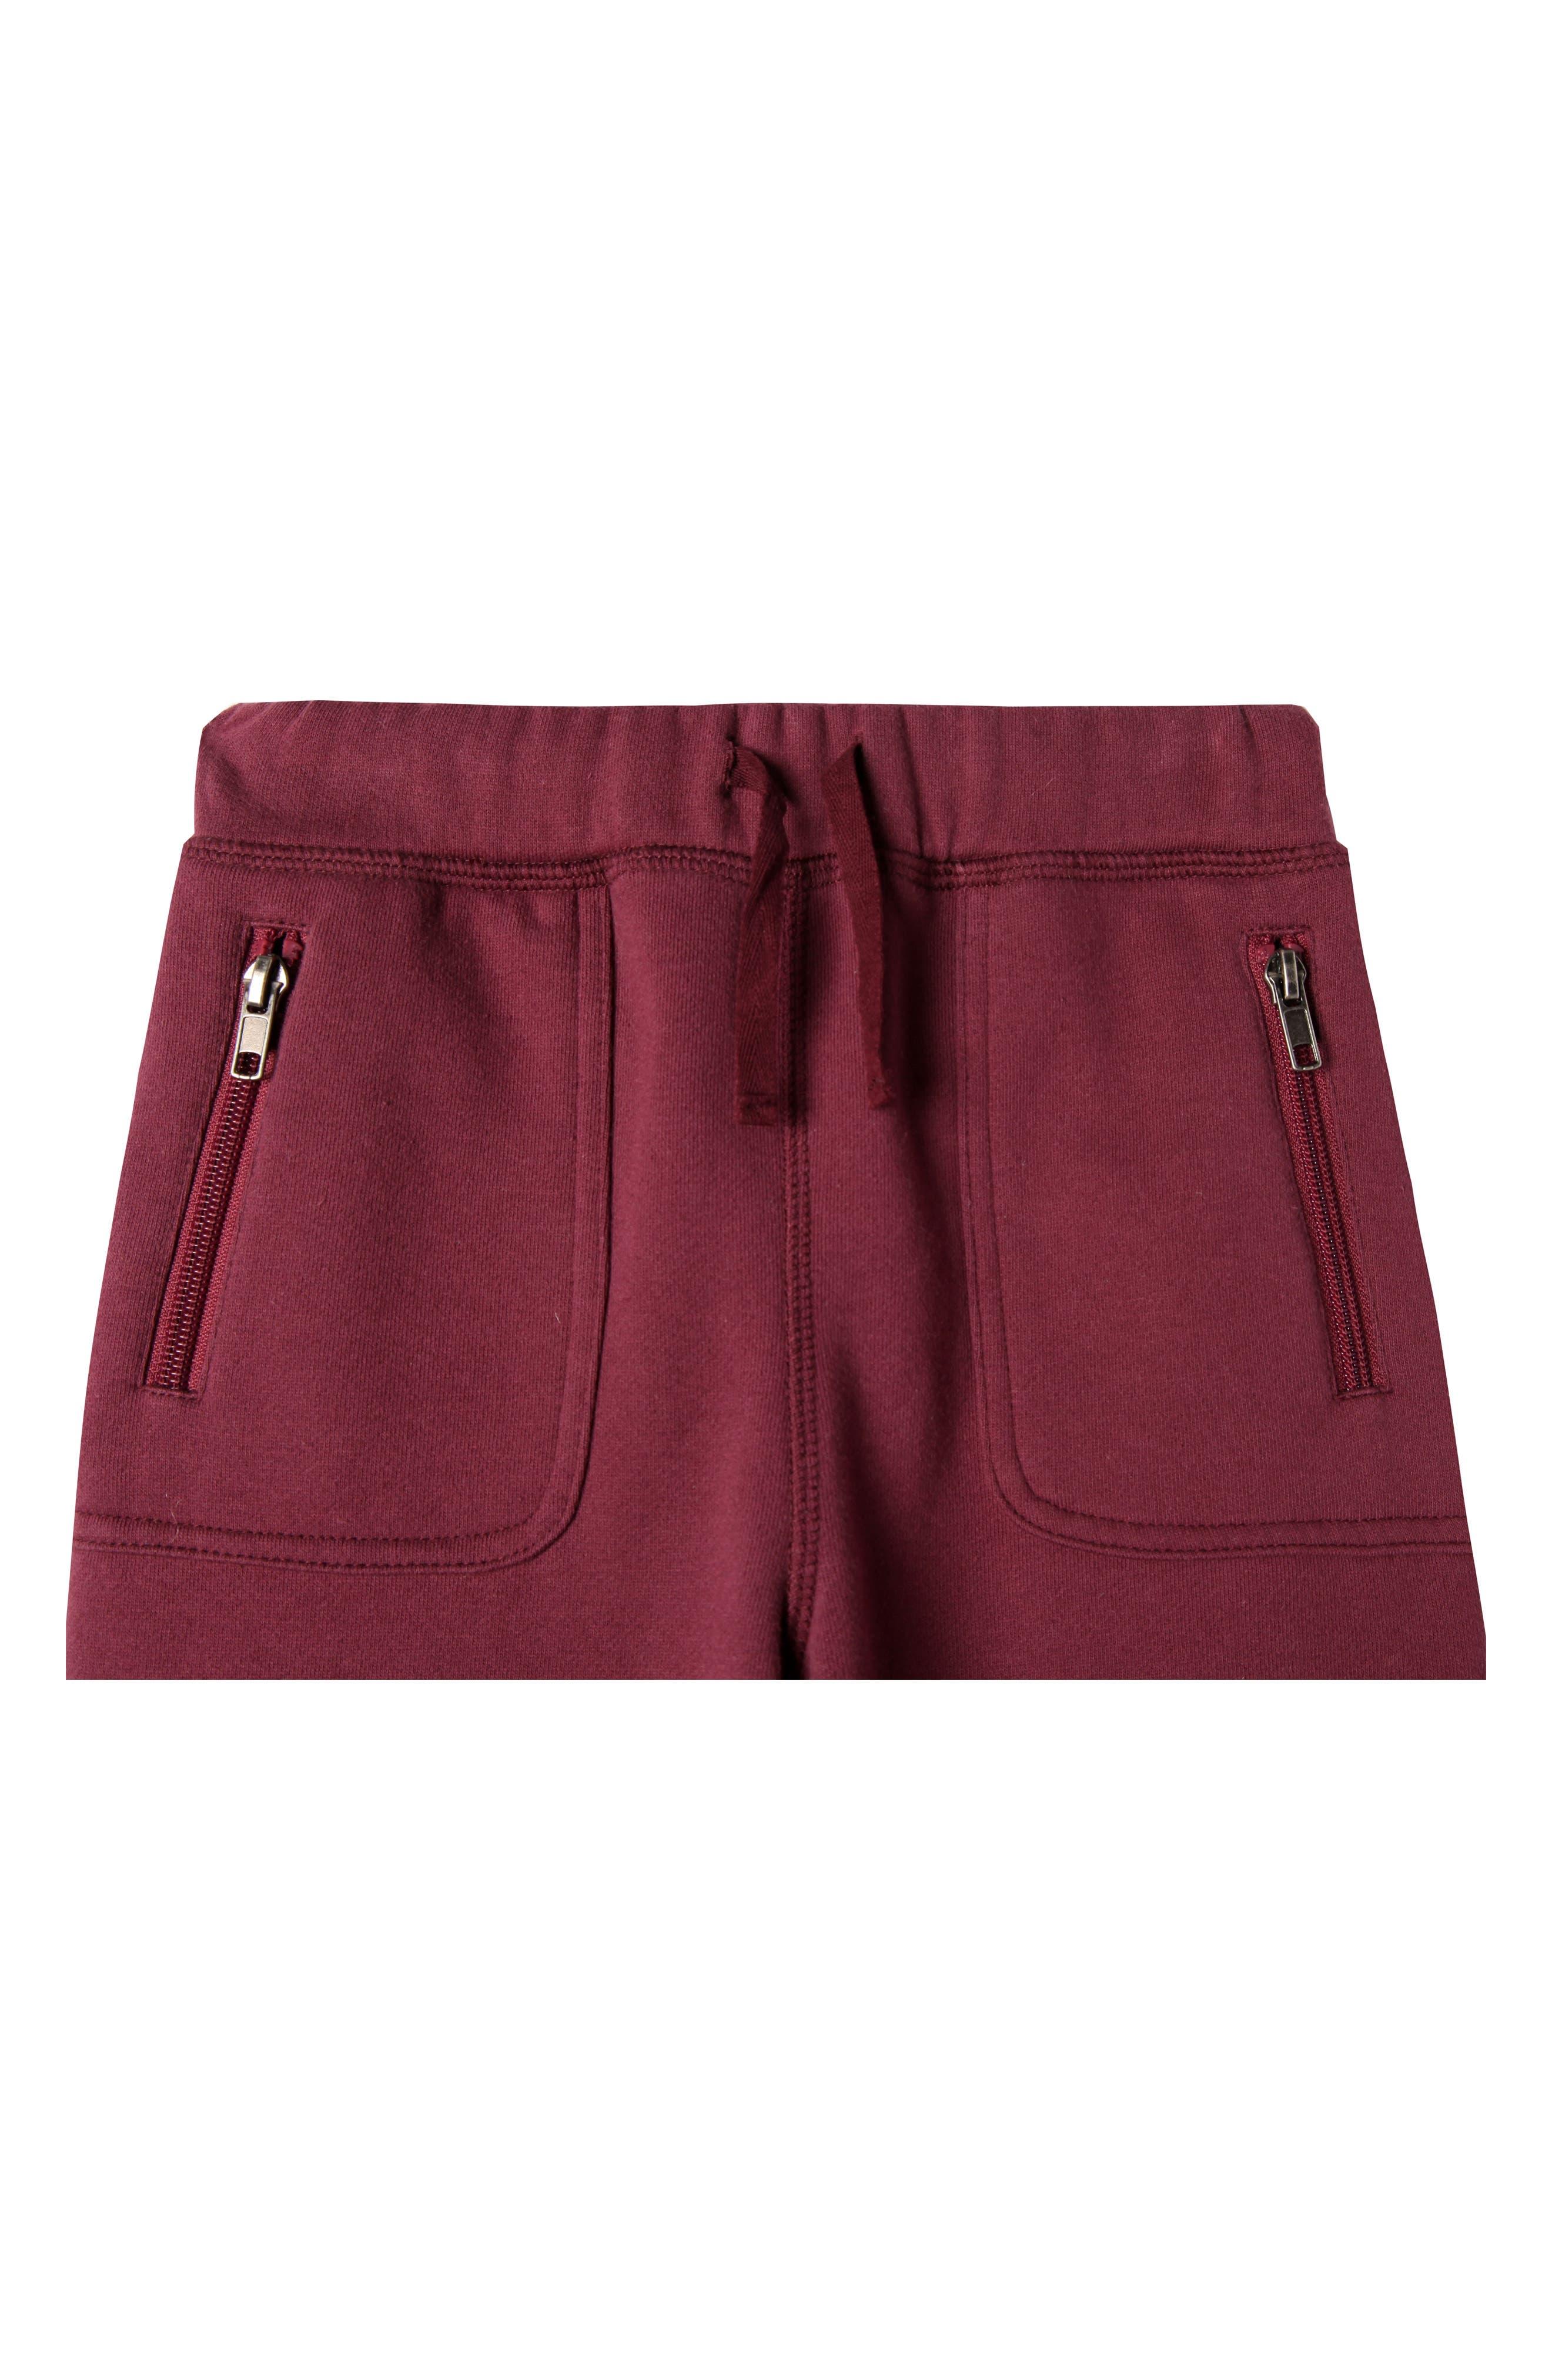 Mercer Jogger Pants,                             Alternate thumbnail 3, color,                             Andora